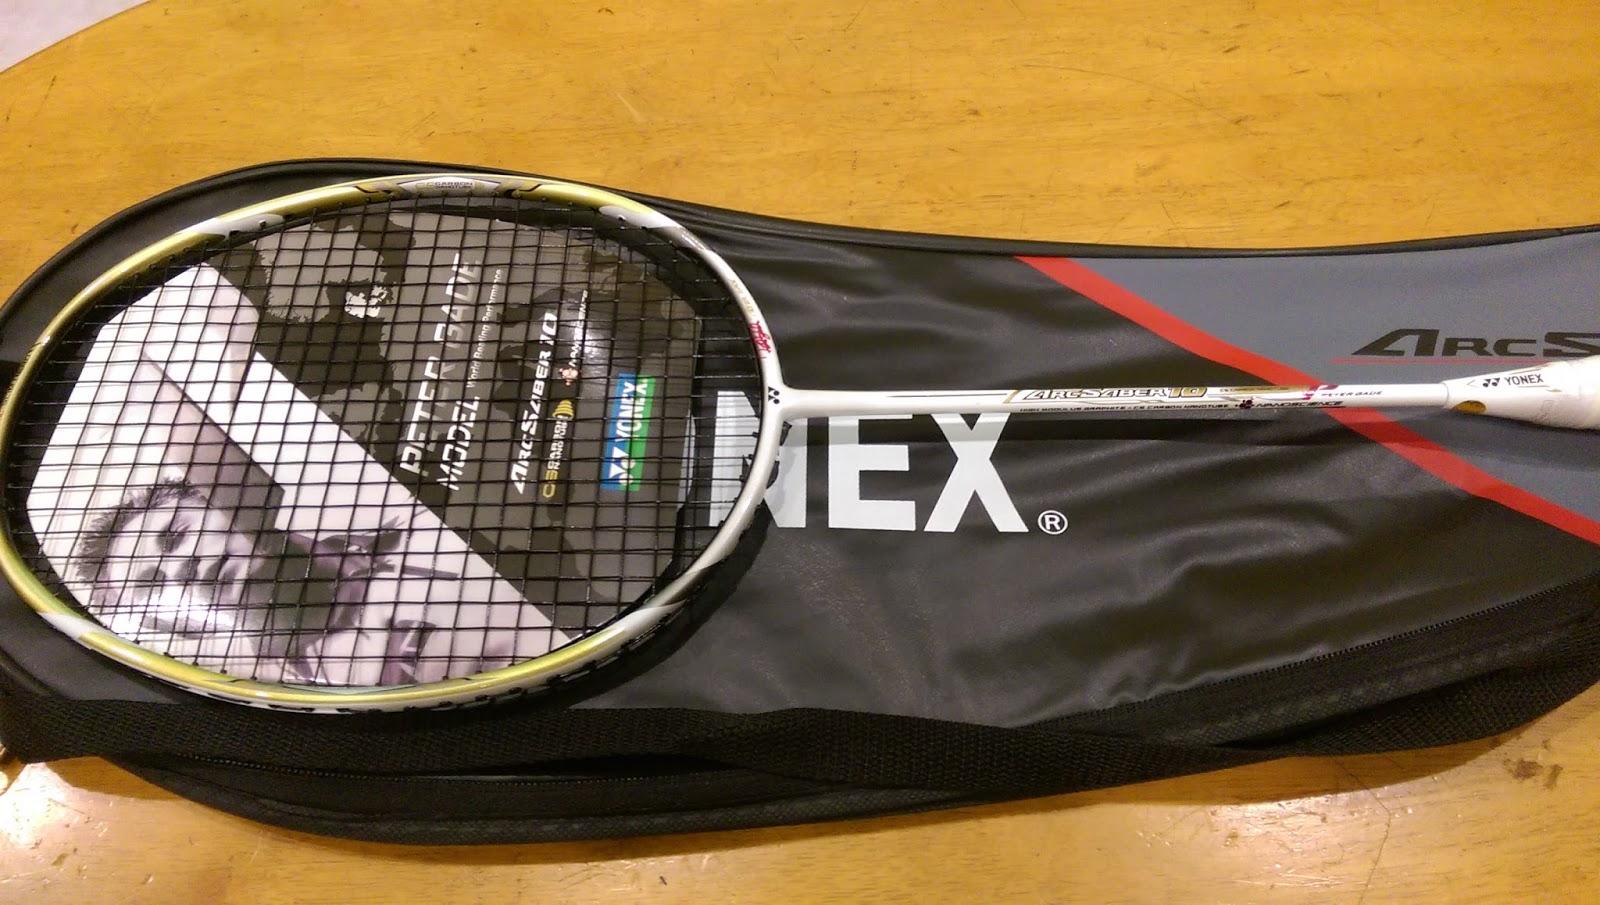 Racket Badminton Yonex Dan Li Ning Murah ArcSaber